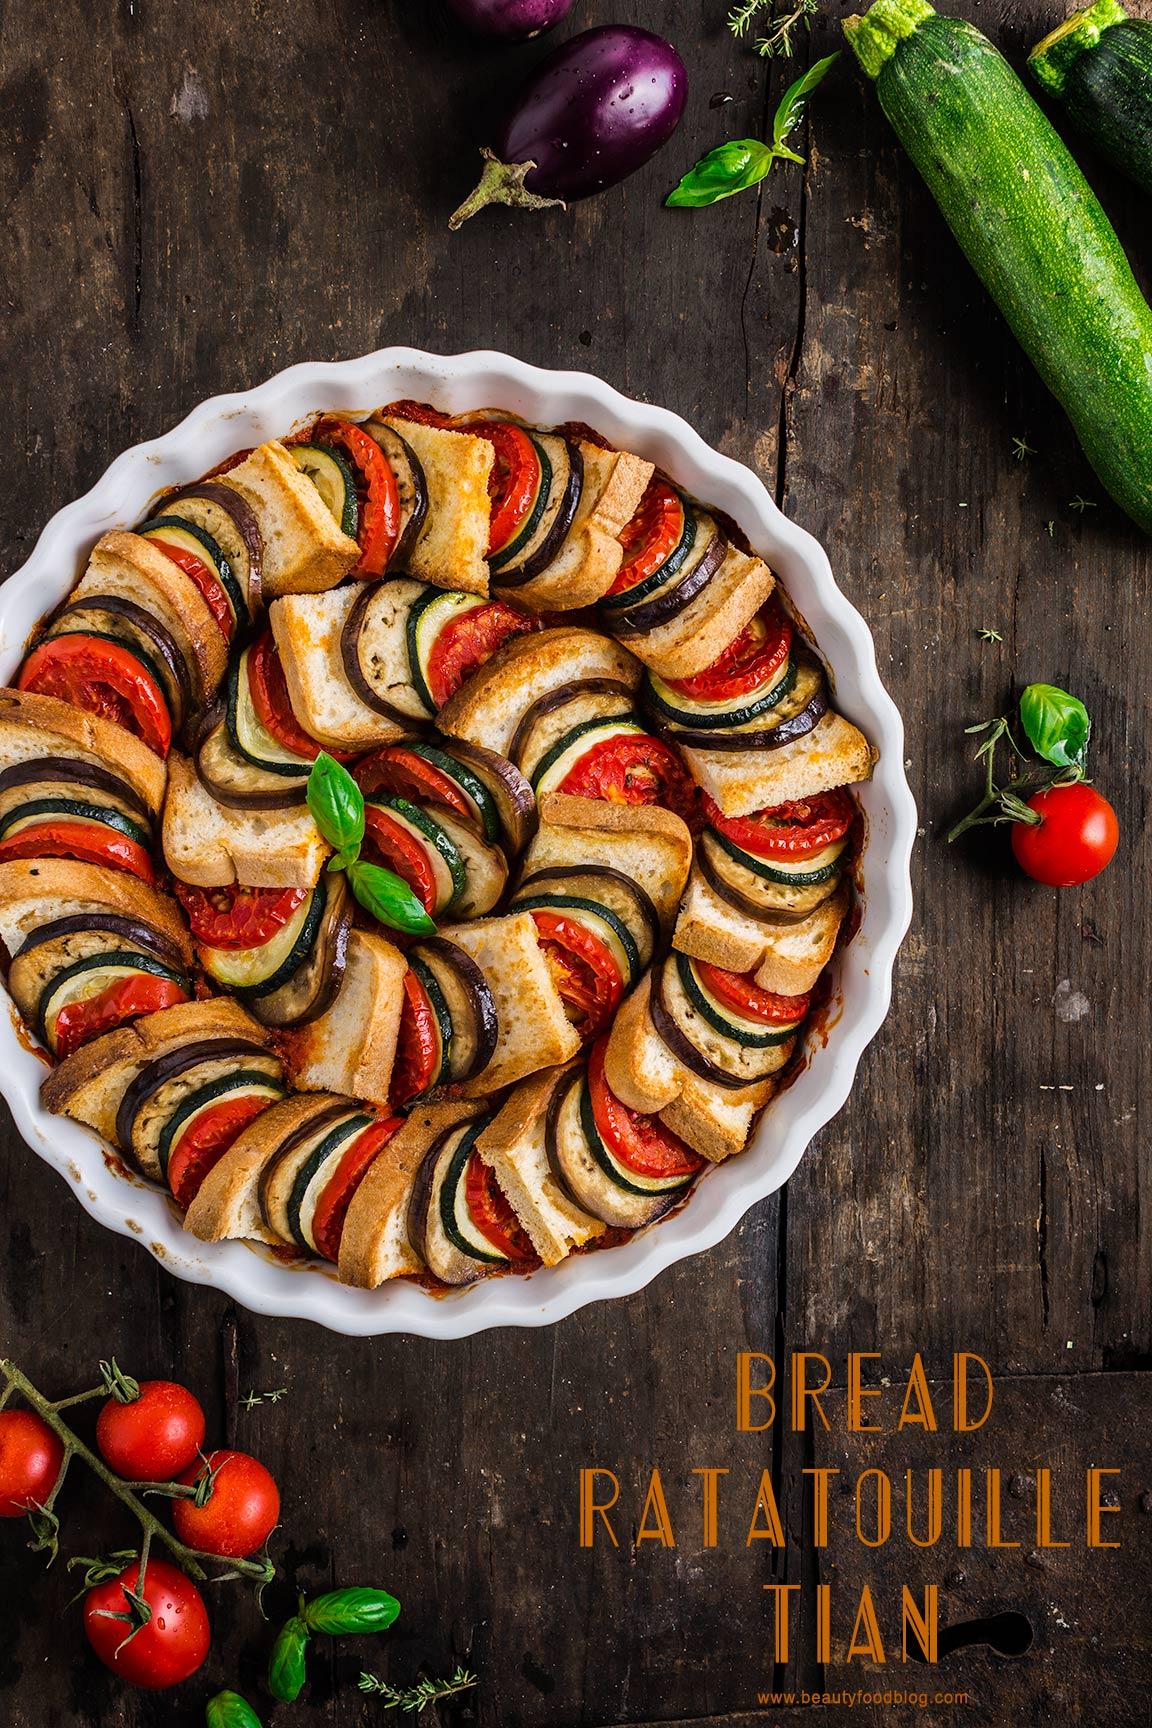 VEGETABLE BREAD #RATATOUILLE TIAN recipe - TIAN RATATOUILLE di pane senza glutine con verdure melanzane zucchine pomodori